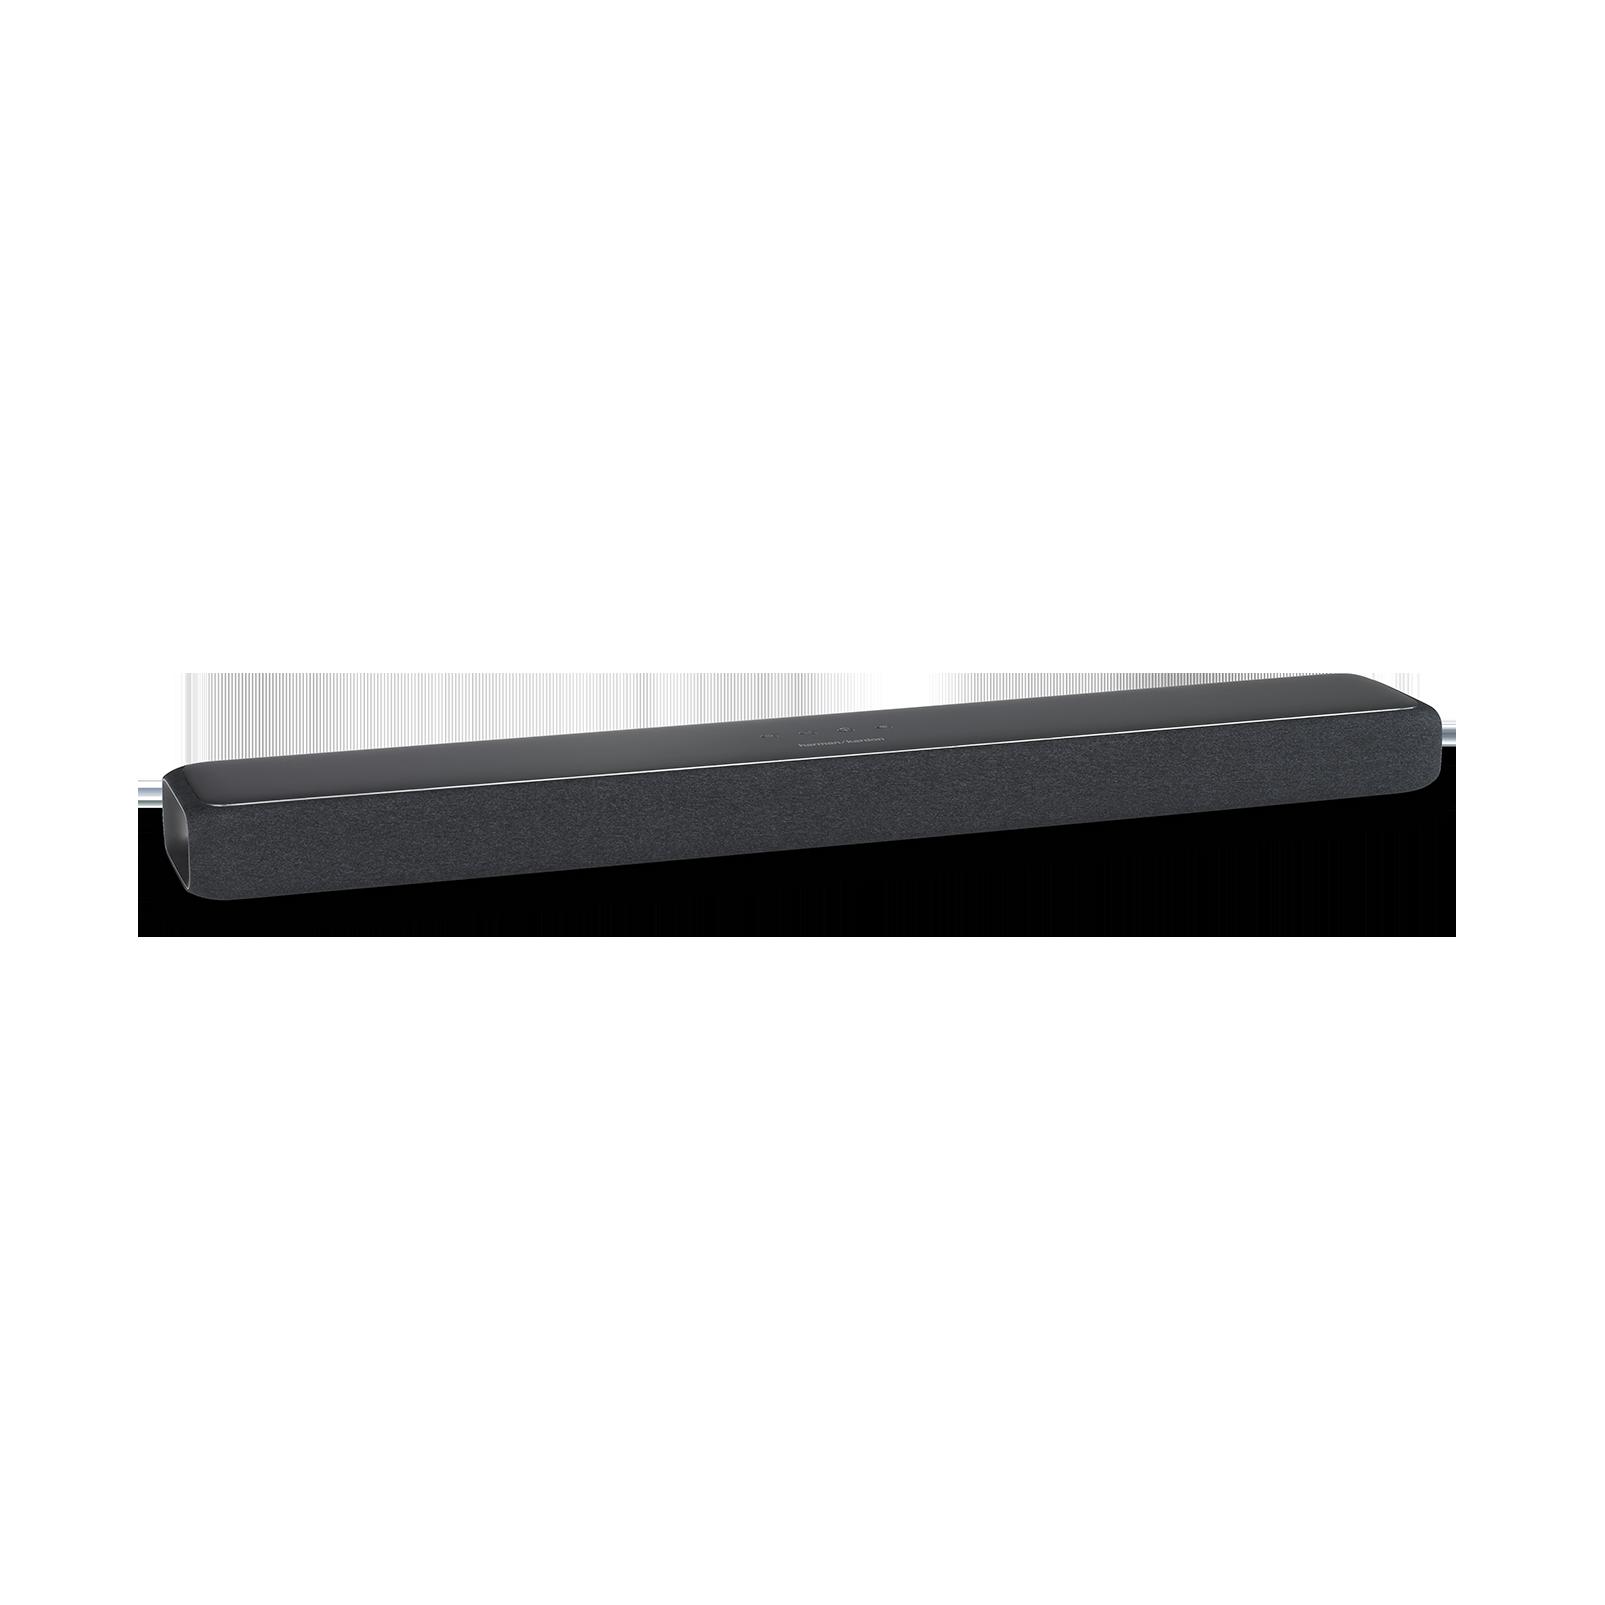 Enchant 800 - Graphite - All in One 8-Channel Soundbar with MultiBeam™ Surround Sound - Hero